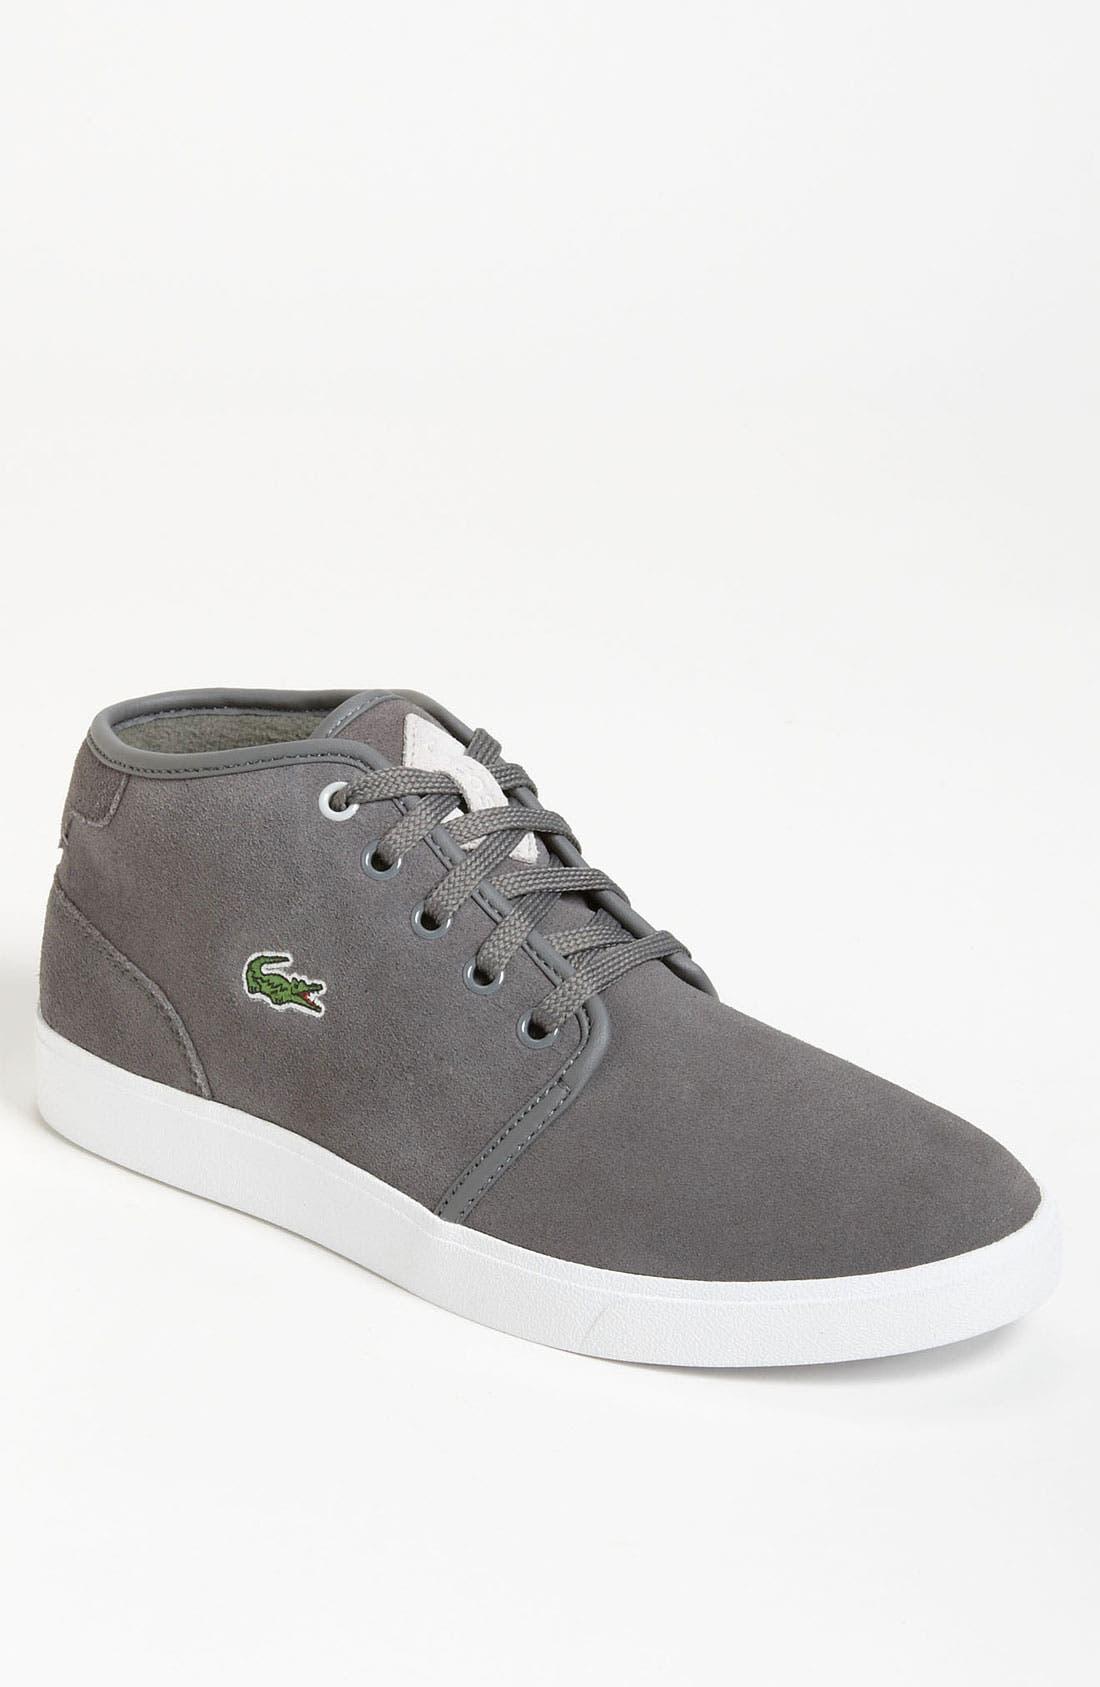 Alternate Image 1 Selected - Lacoste 'Benoit CIW' Sneaker